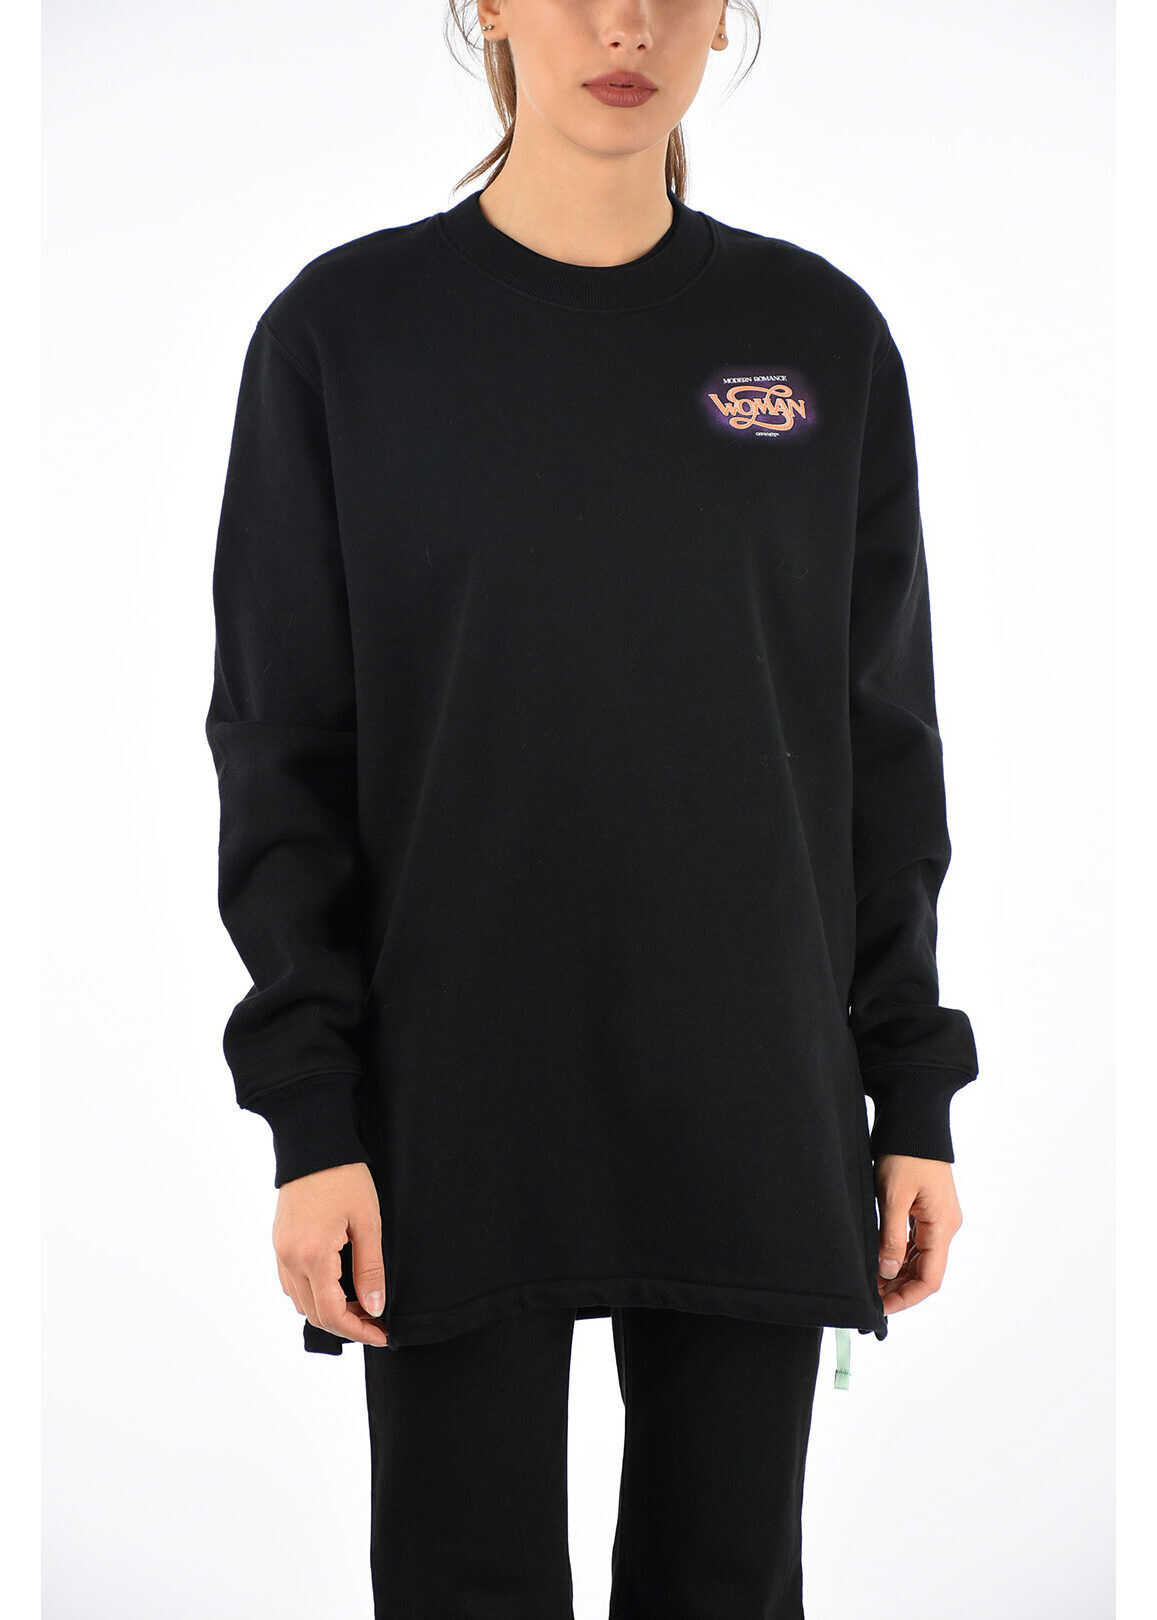 Off-White Printed Sweatshirt BLACK